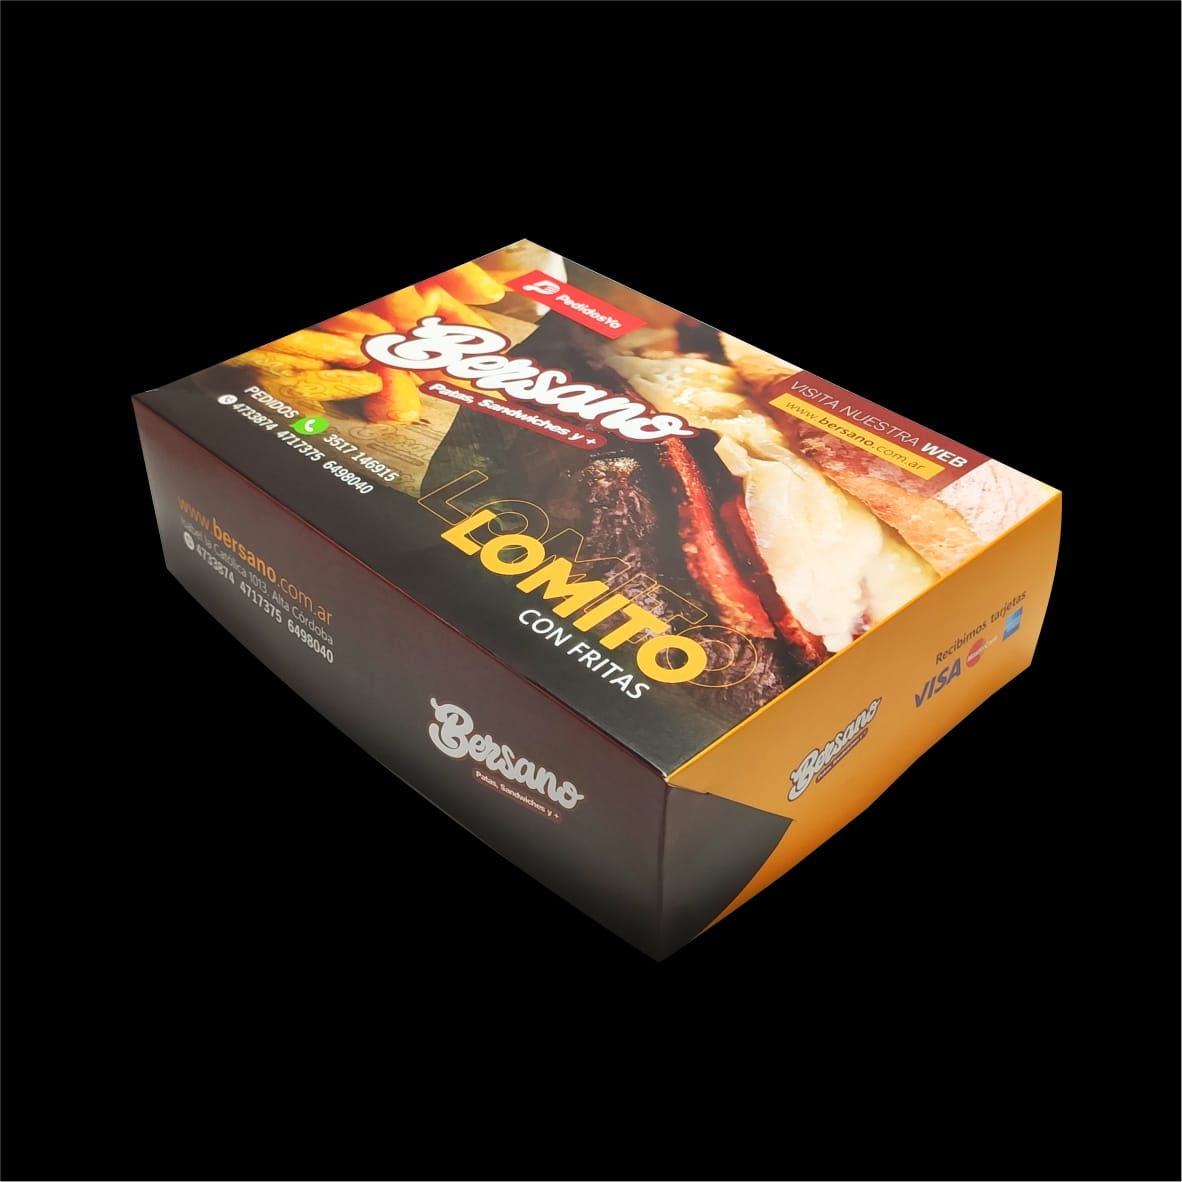 Packaging  Bersano